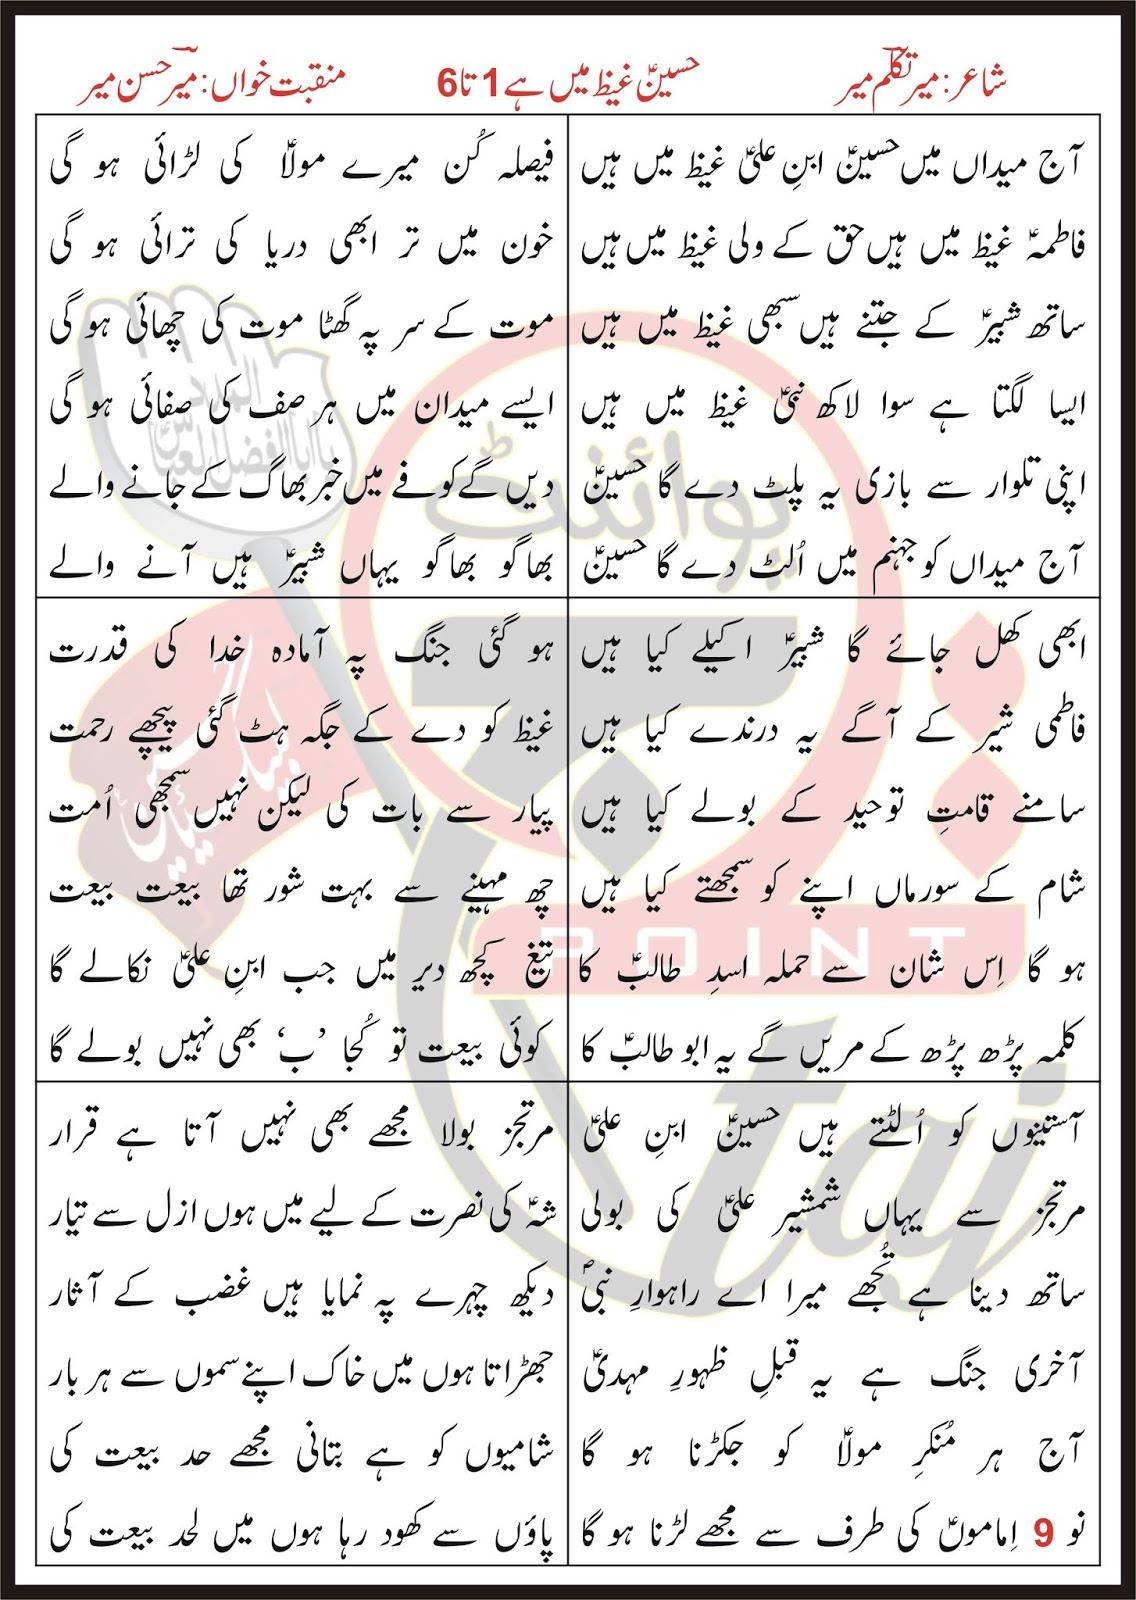 Lyrics In Urdu and Roman Urdu TAJpoINT Poetry